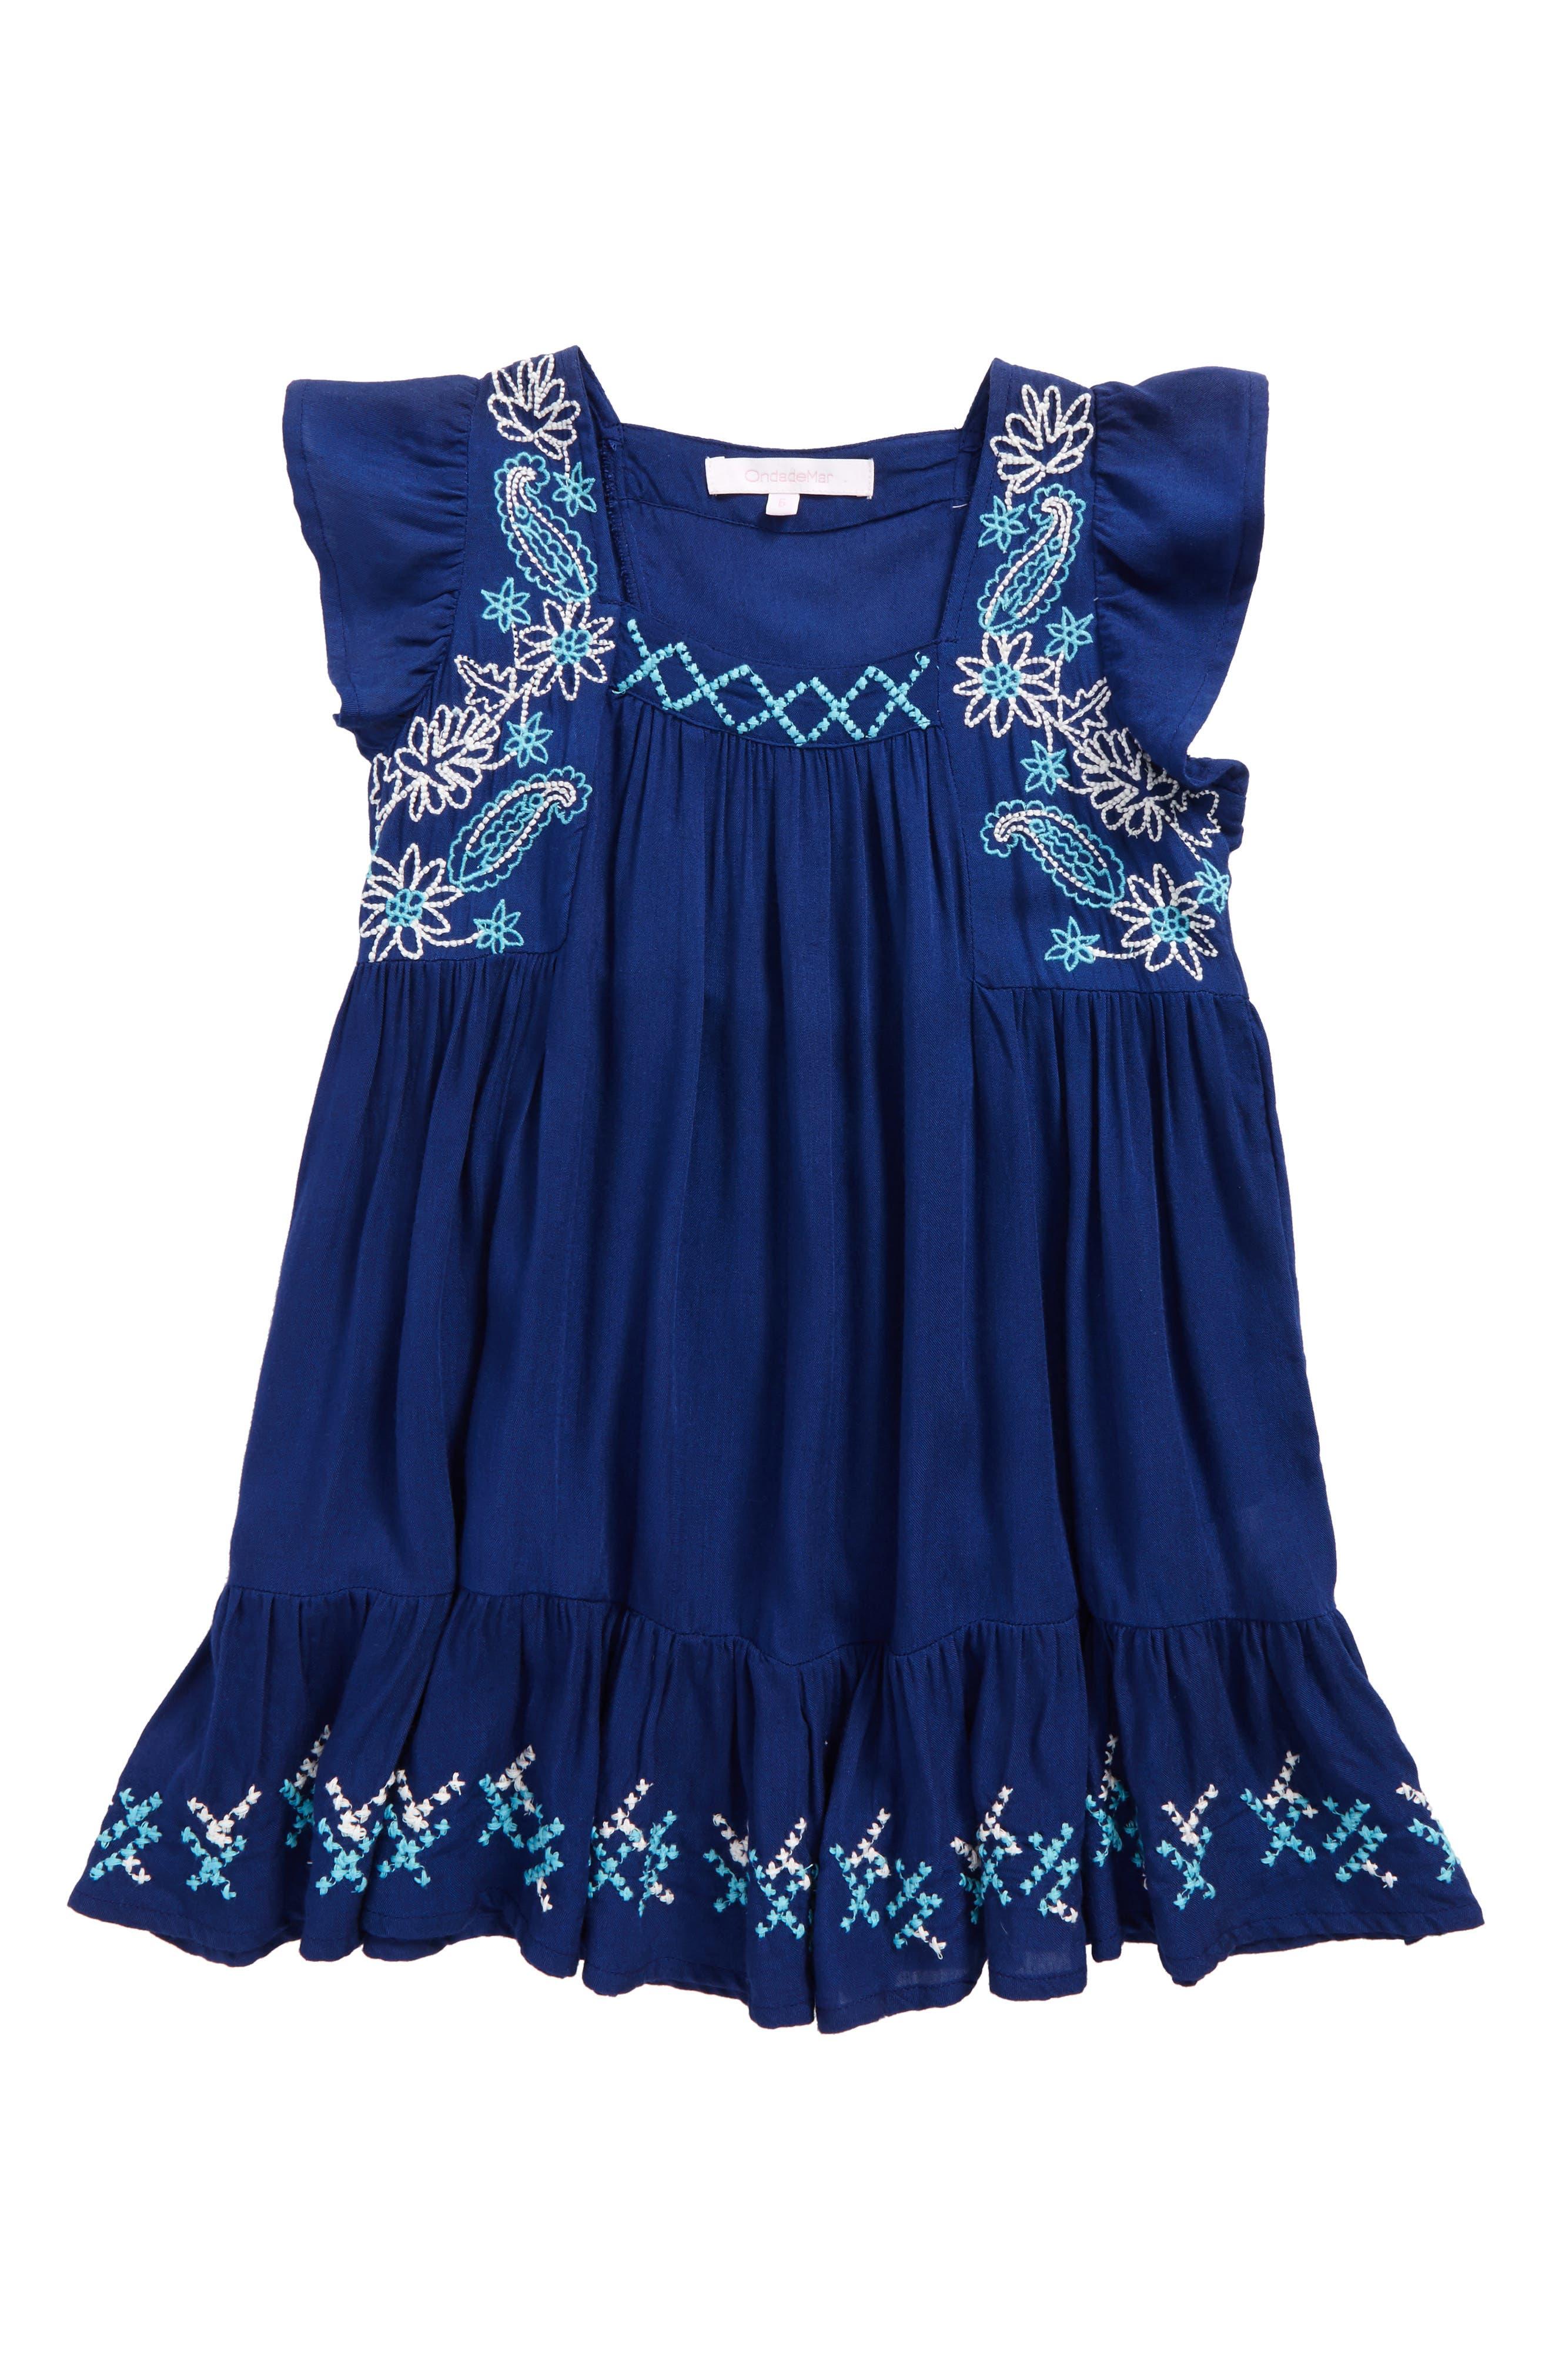 Lotto Cover-Up Dress,                             Main thumbnail 1, color,                             400